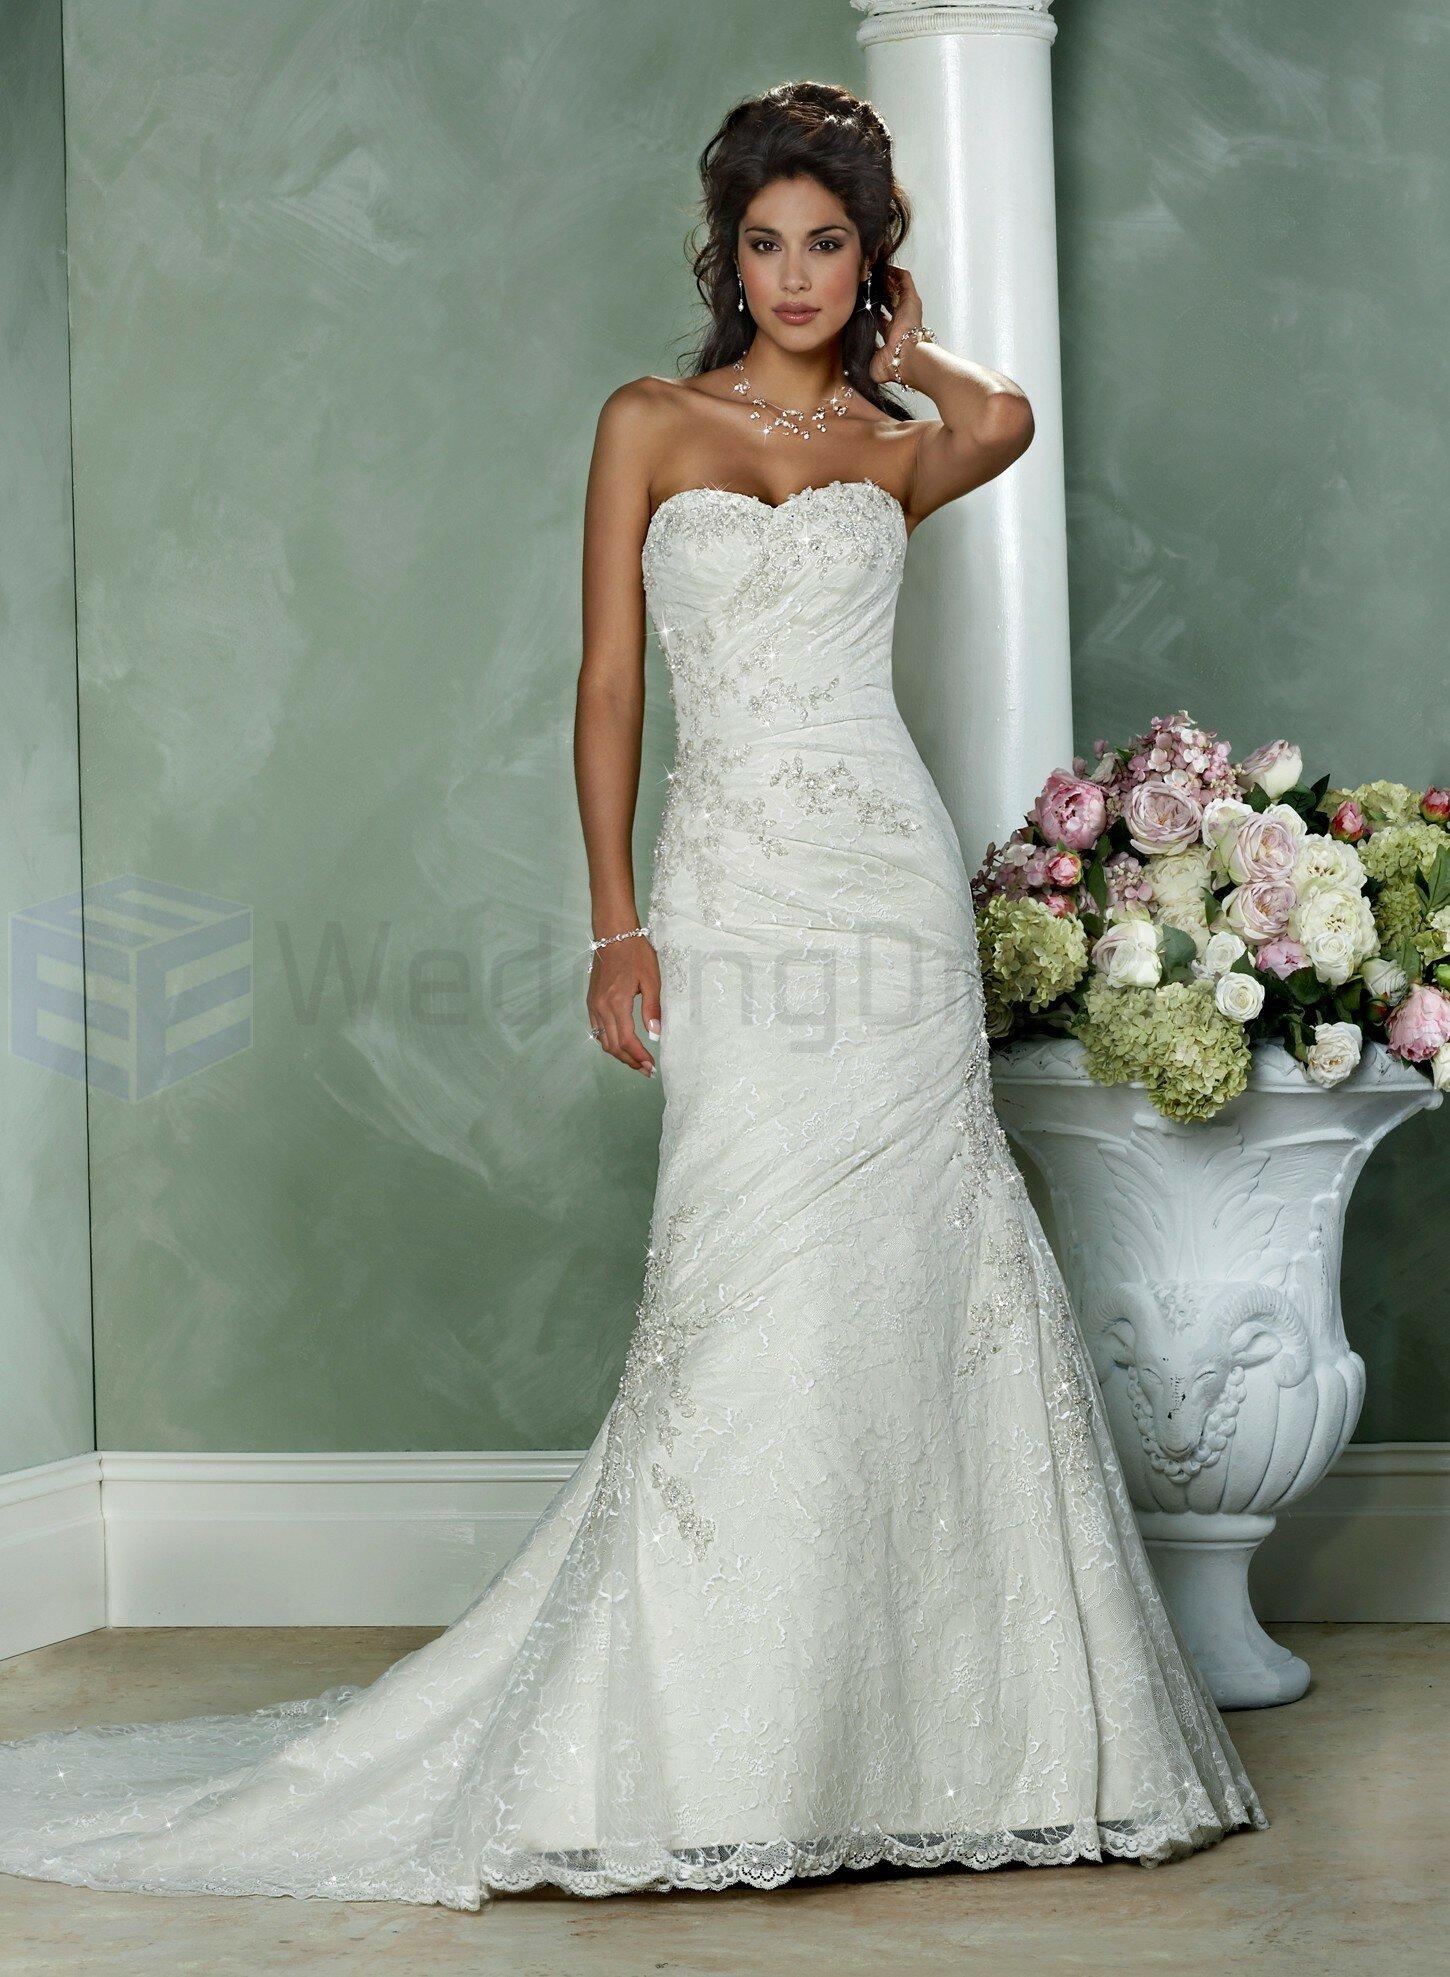 Short strapless wedding dresses photo - 3